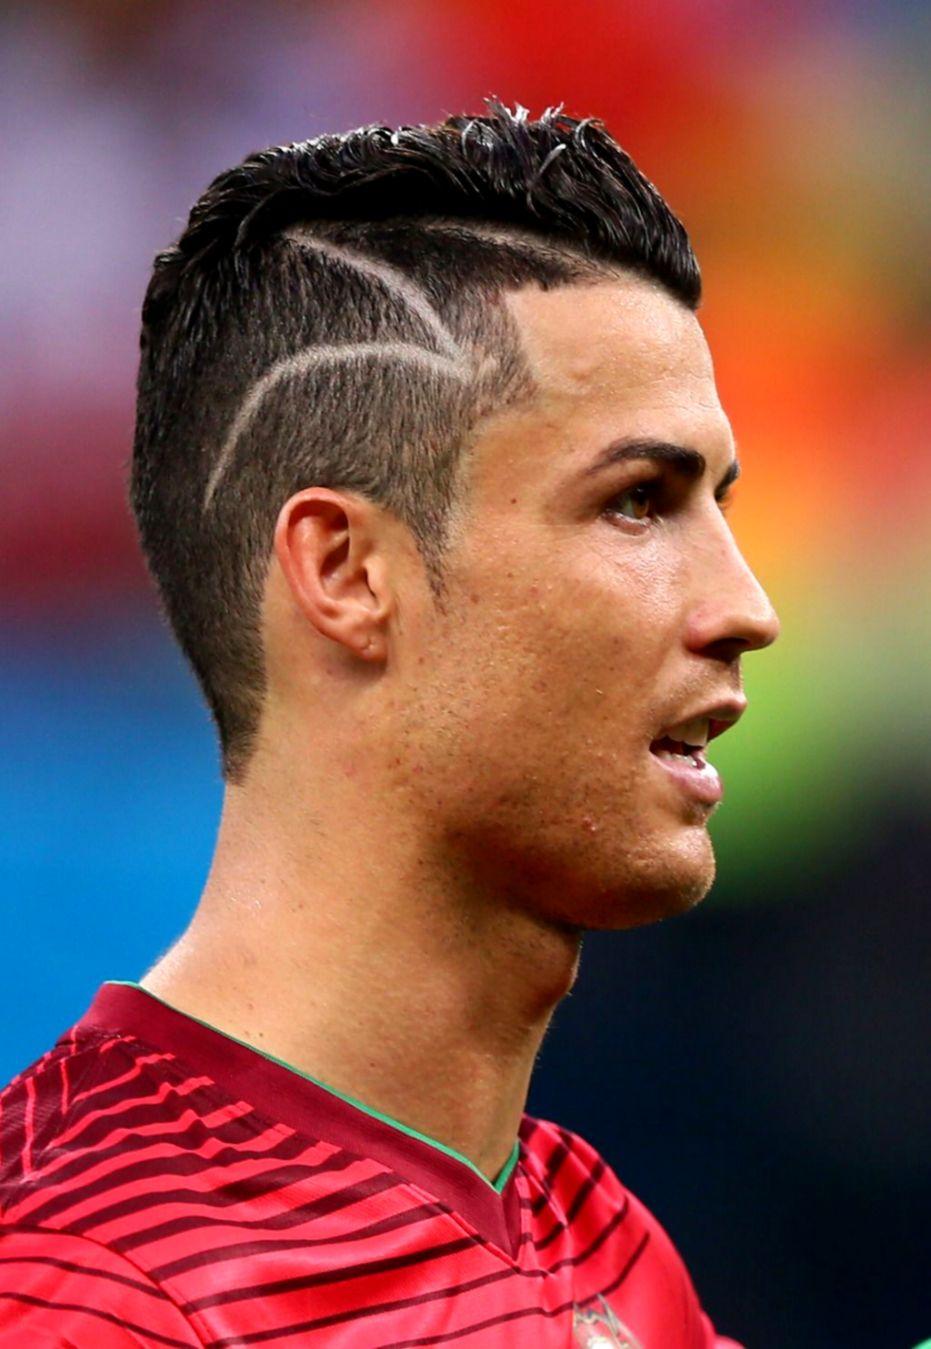 New Hairstyle Ronaldo Wallpapers Titan